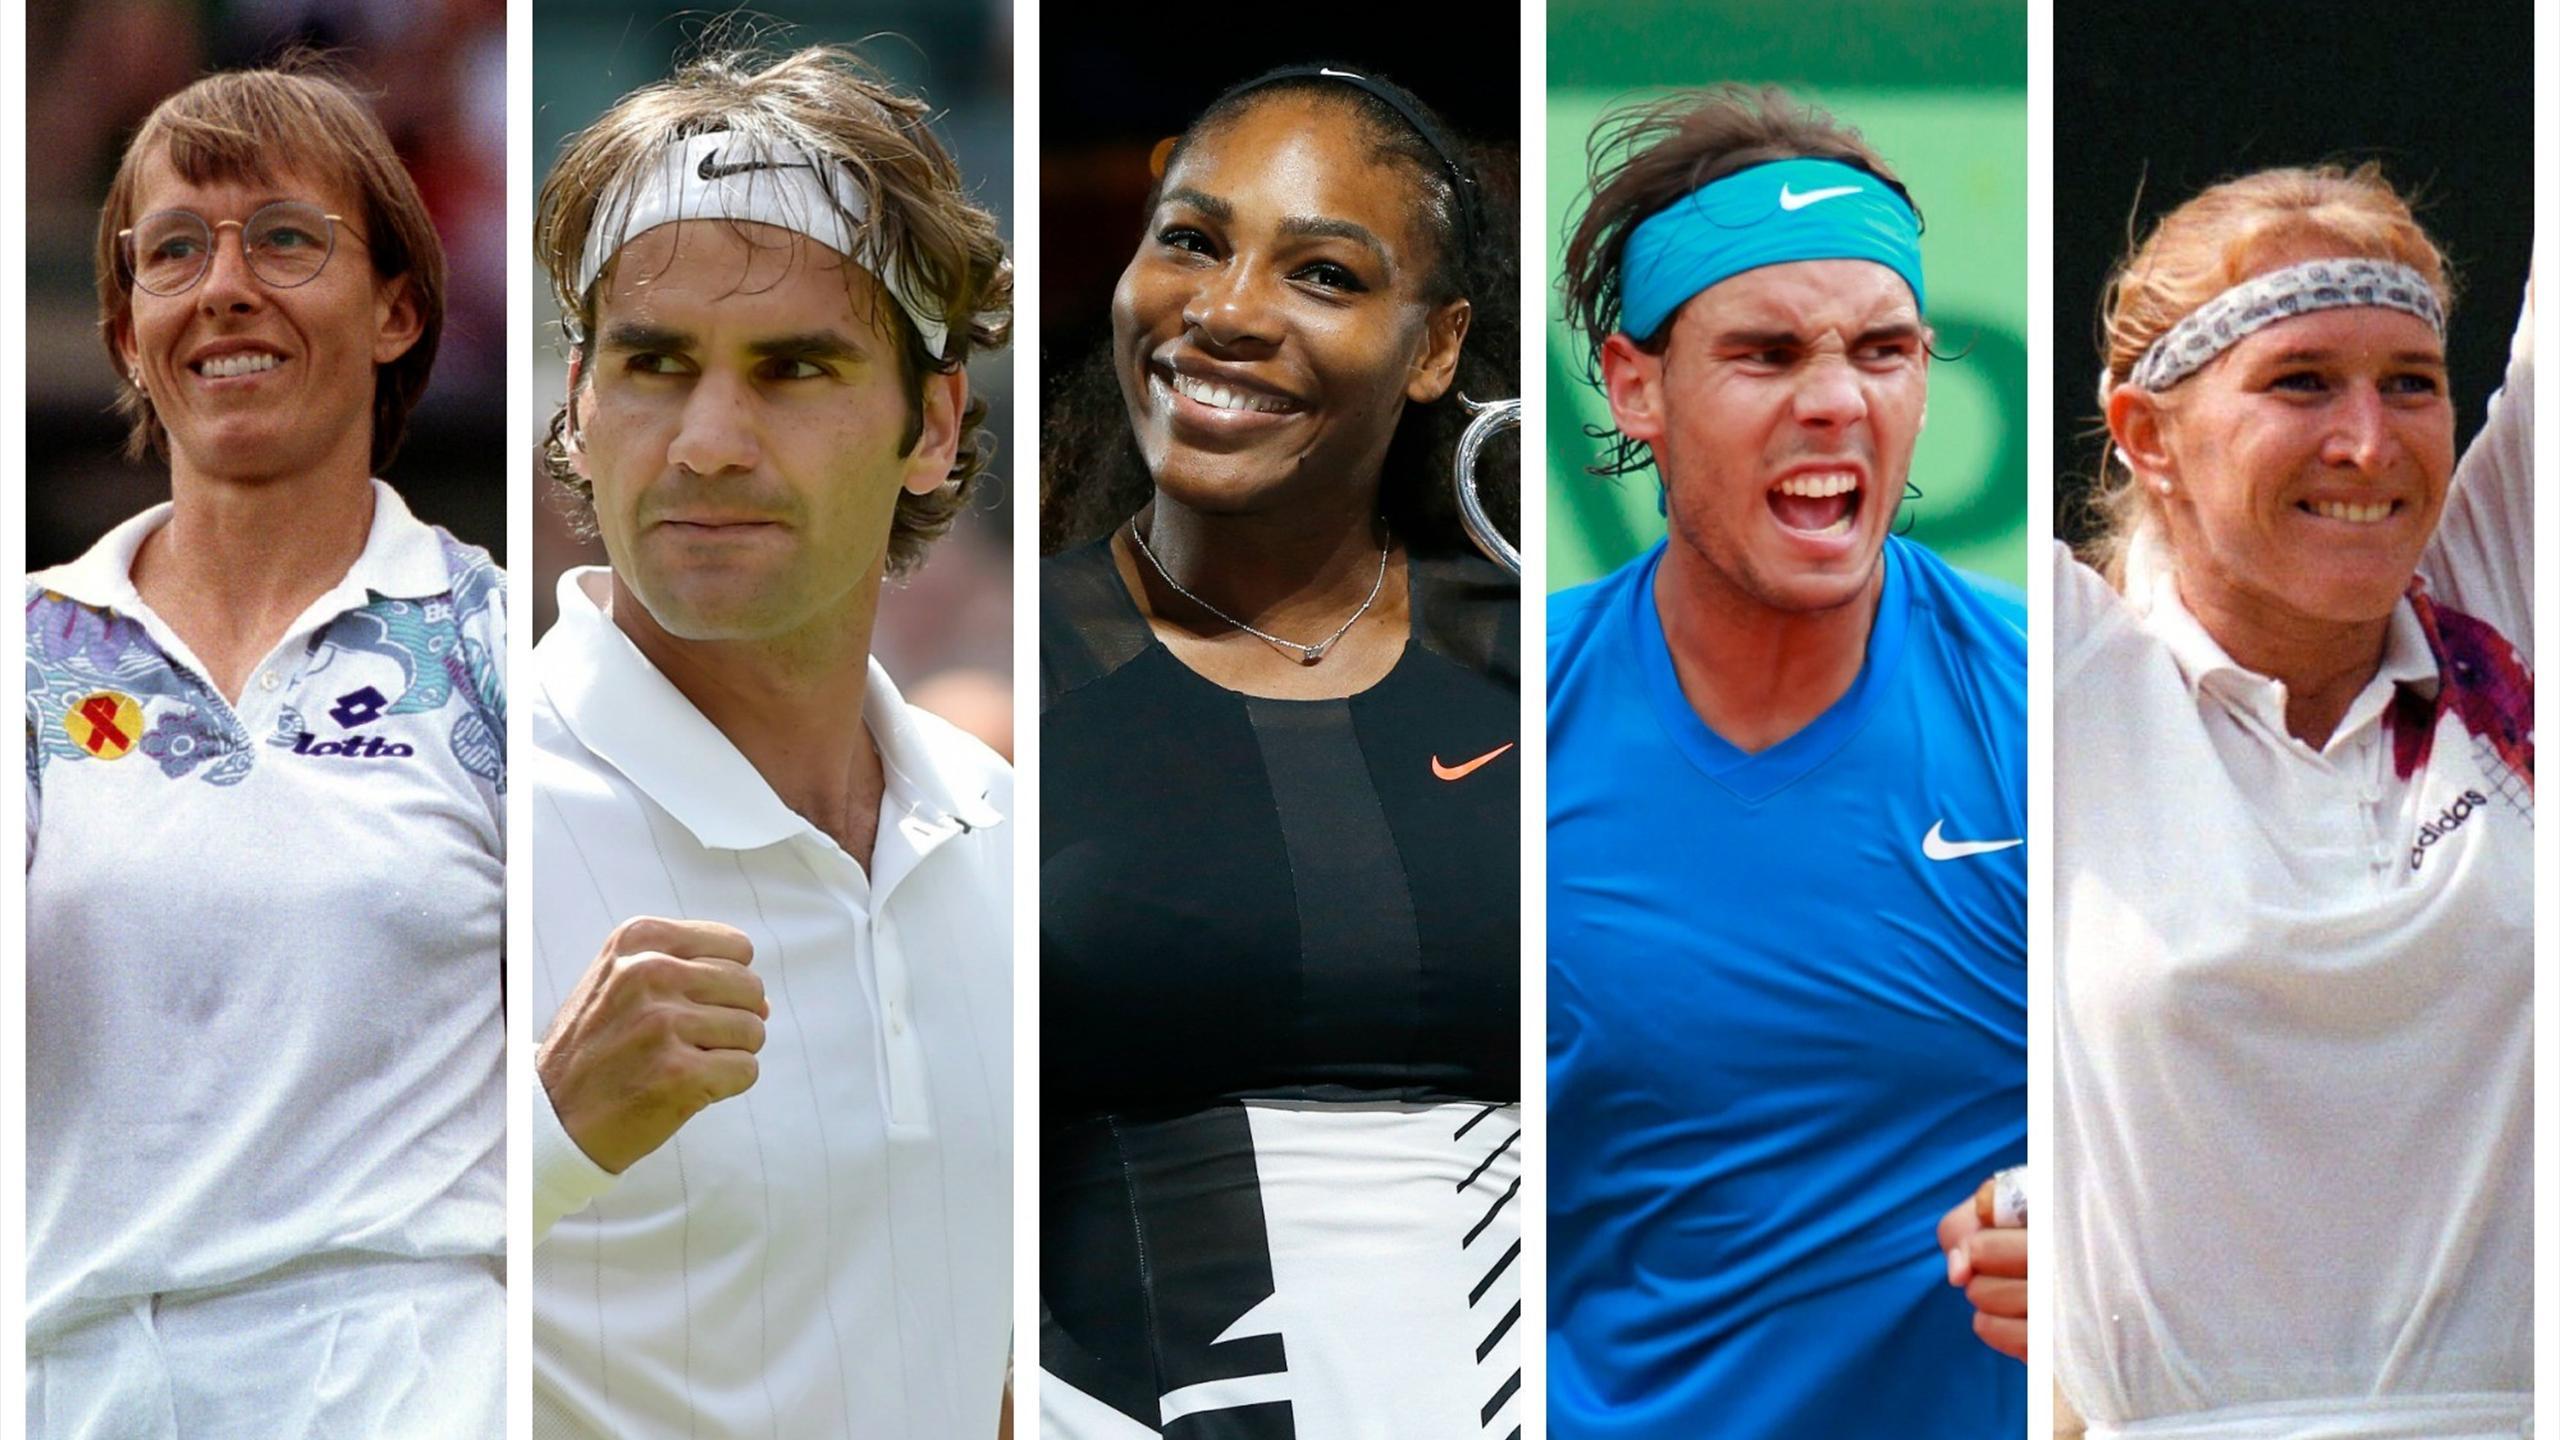 Martina Navratilova, Roger Federer, Serena Williams, Rafael Nadal and Steffi Graf